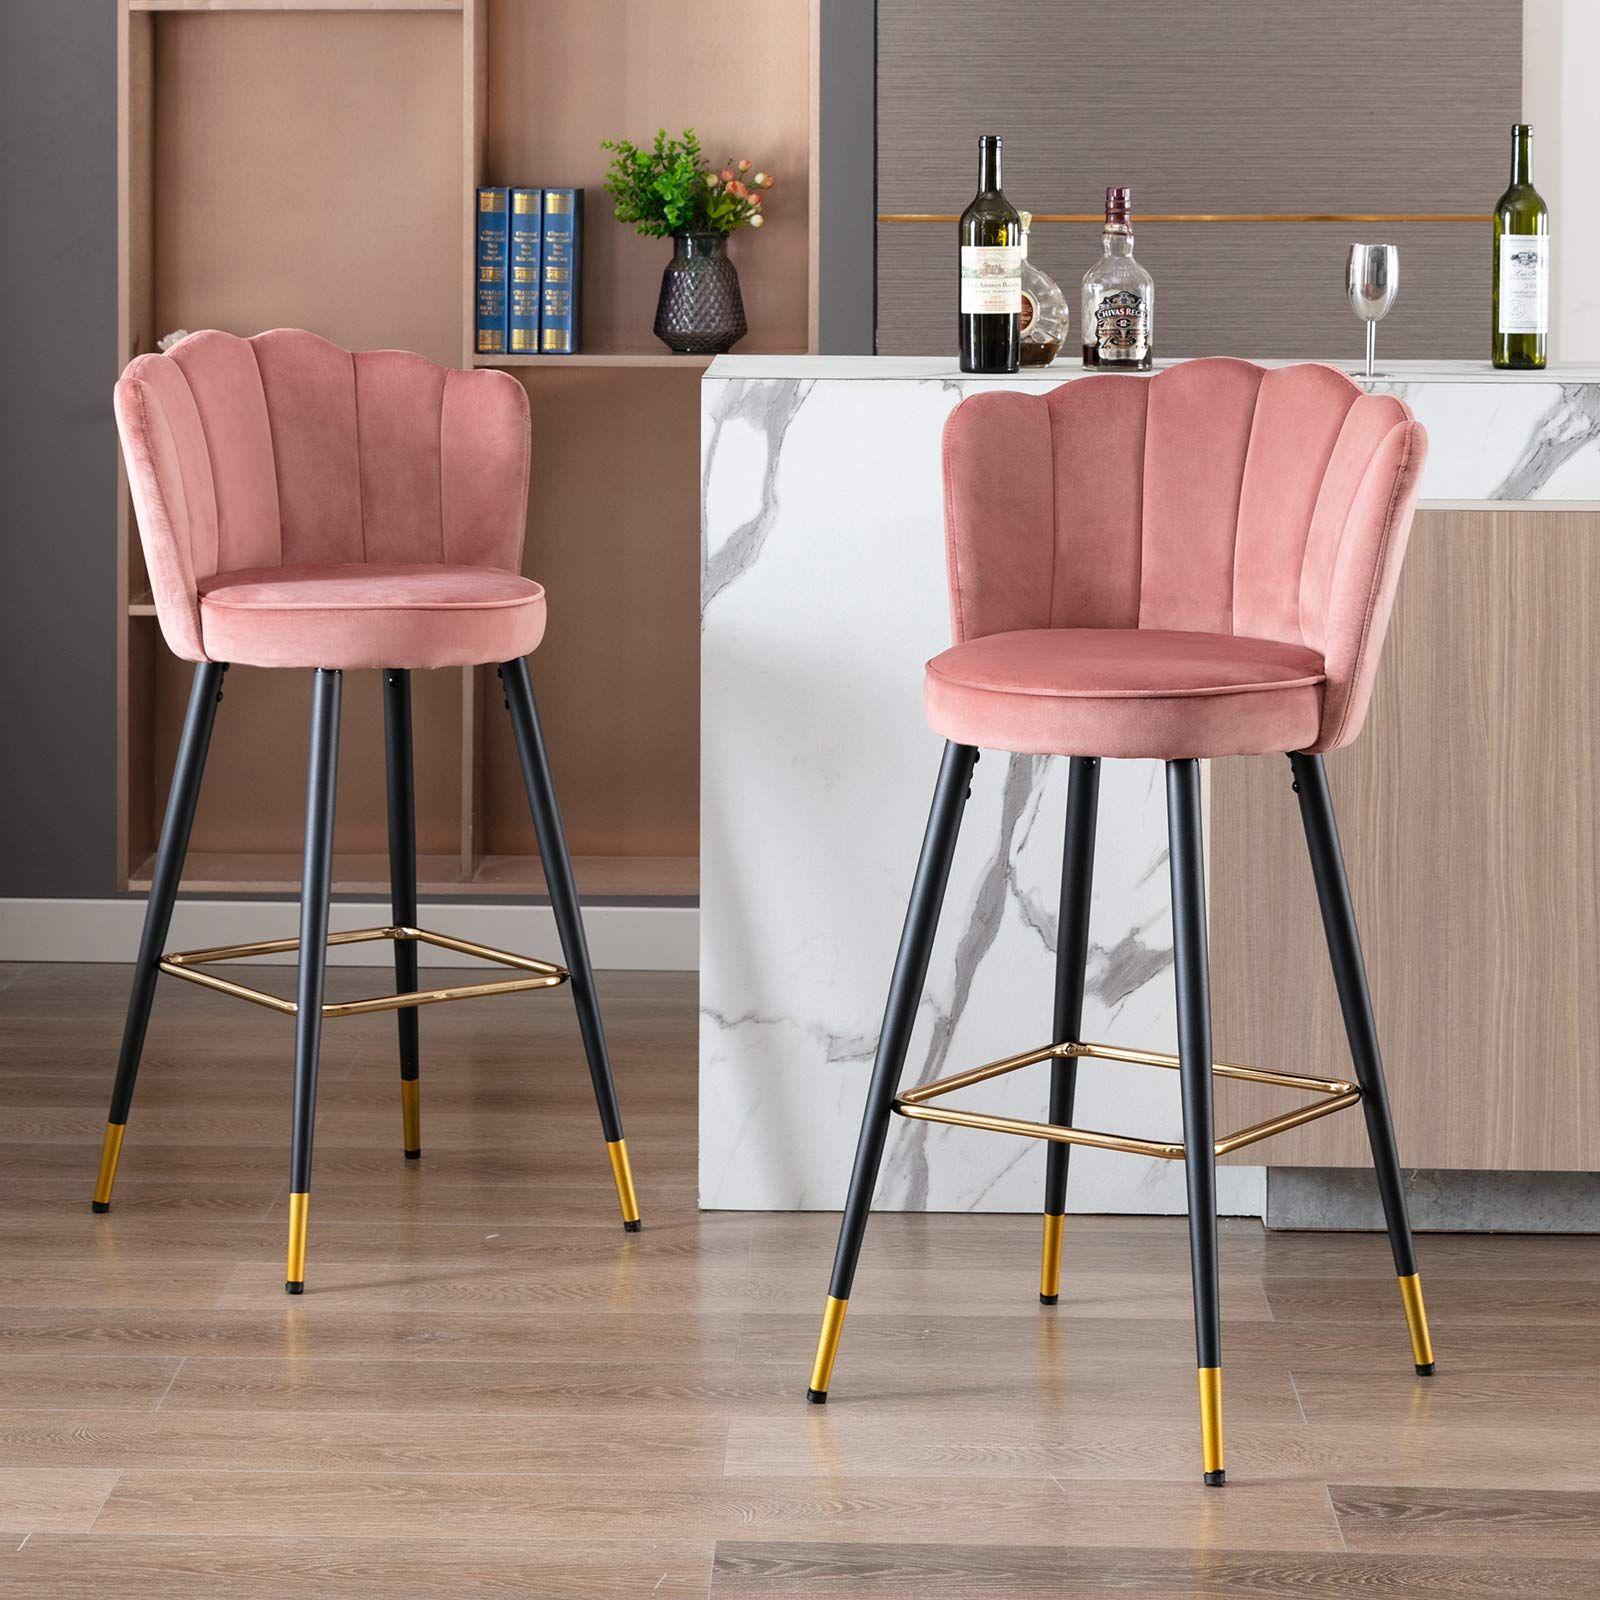 Wahson Velvet Bar Stools Kitchen Counter Stools Set of 9 Bar ...